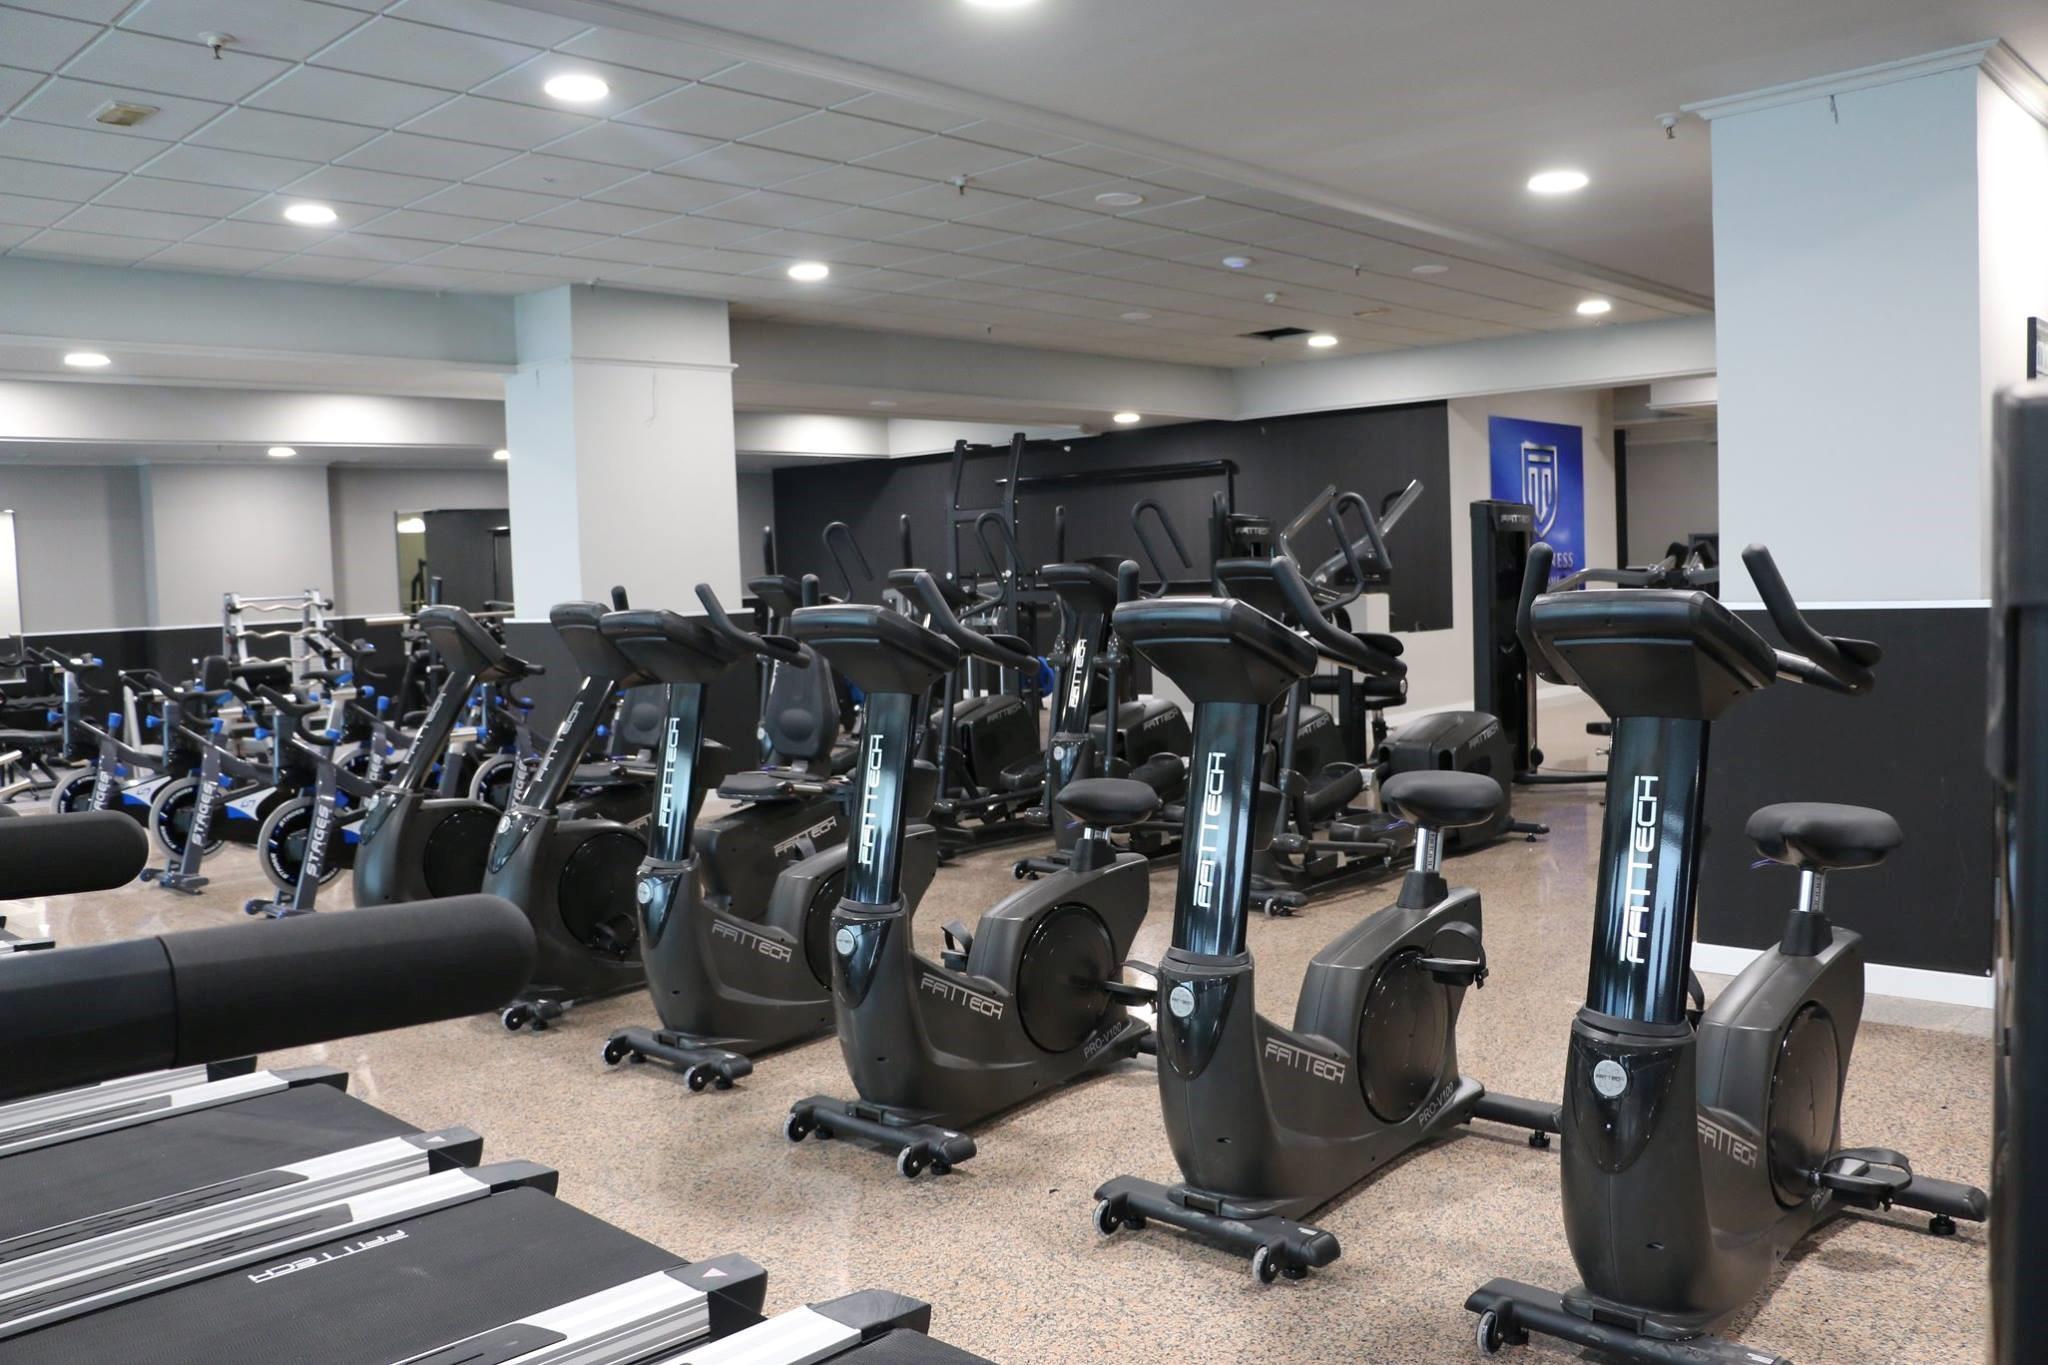 Fit4Life ya ha equipado 20 gimnasios con máquinas fitness FFittech